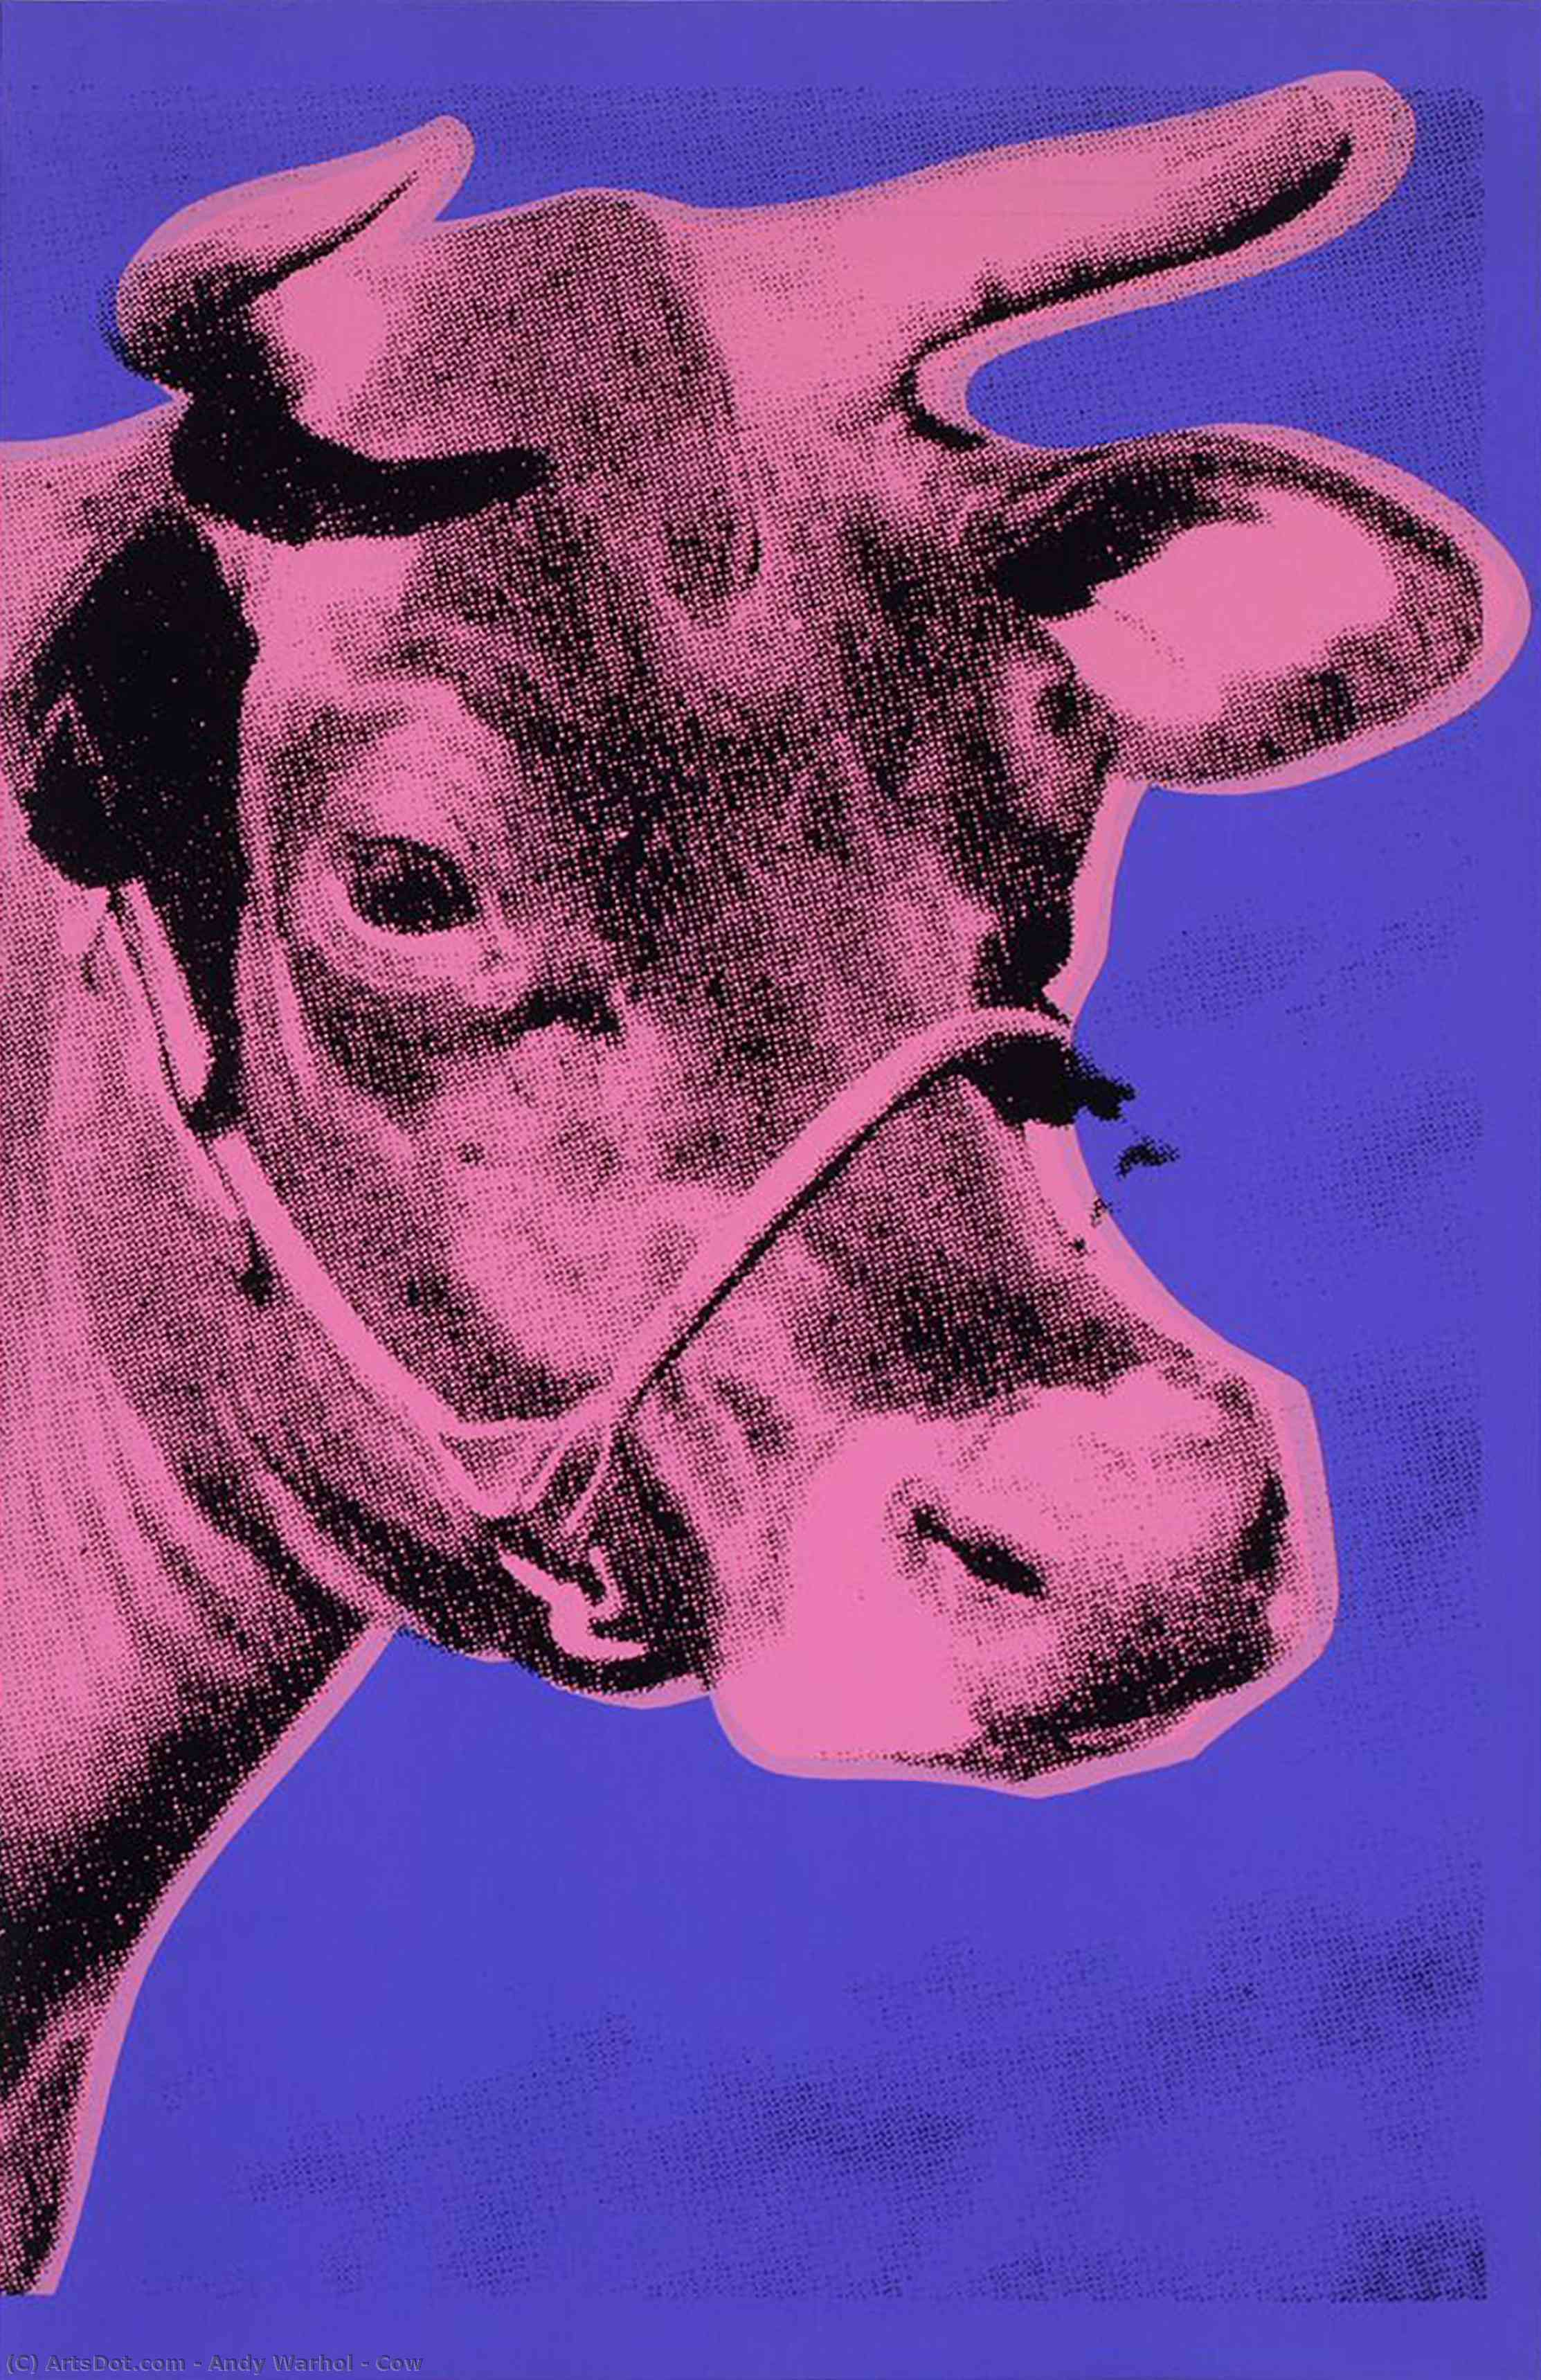 Mucca di Andy Warhol (1928-1987, United States) | | ArtsDot.com